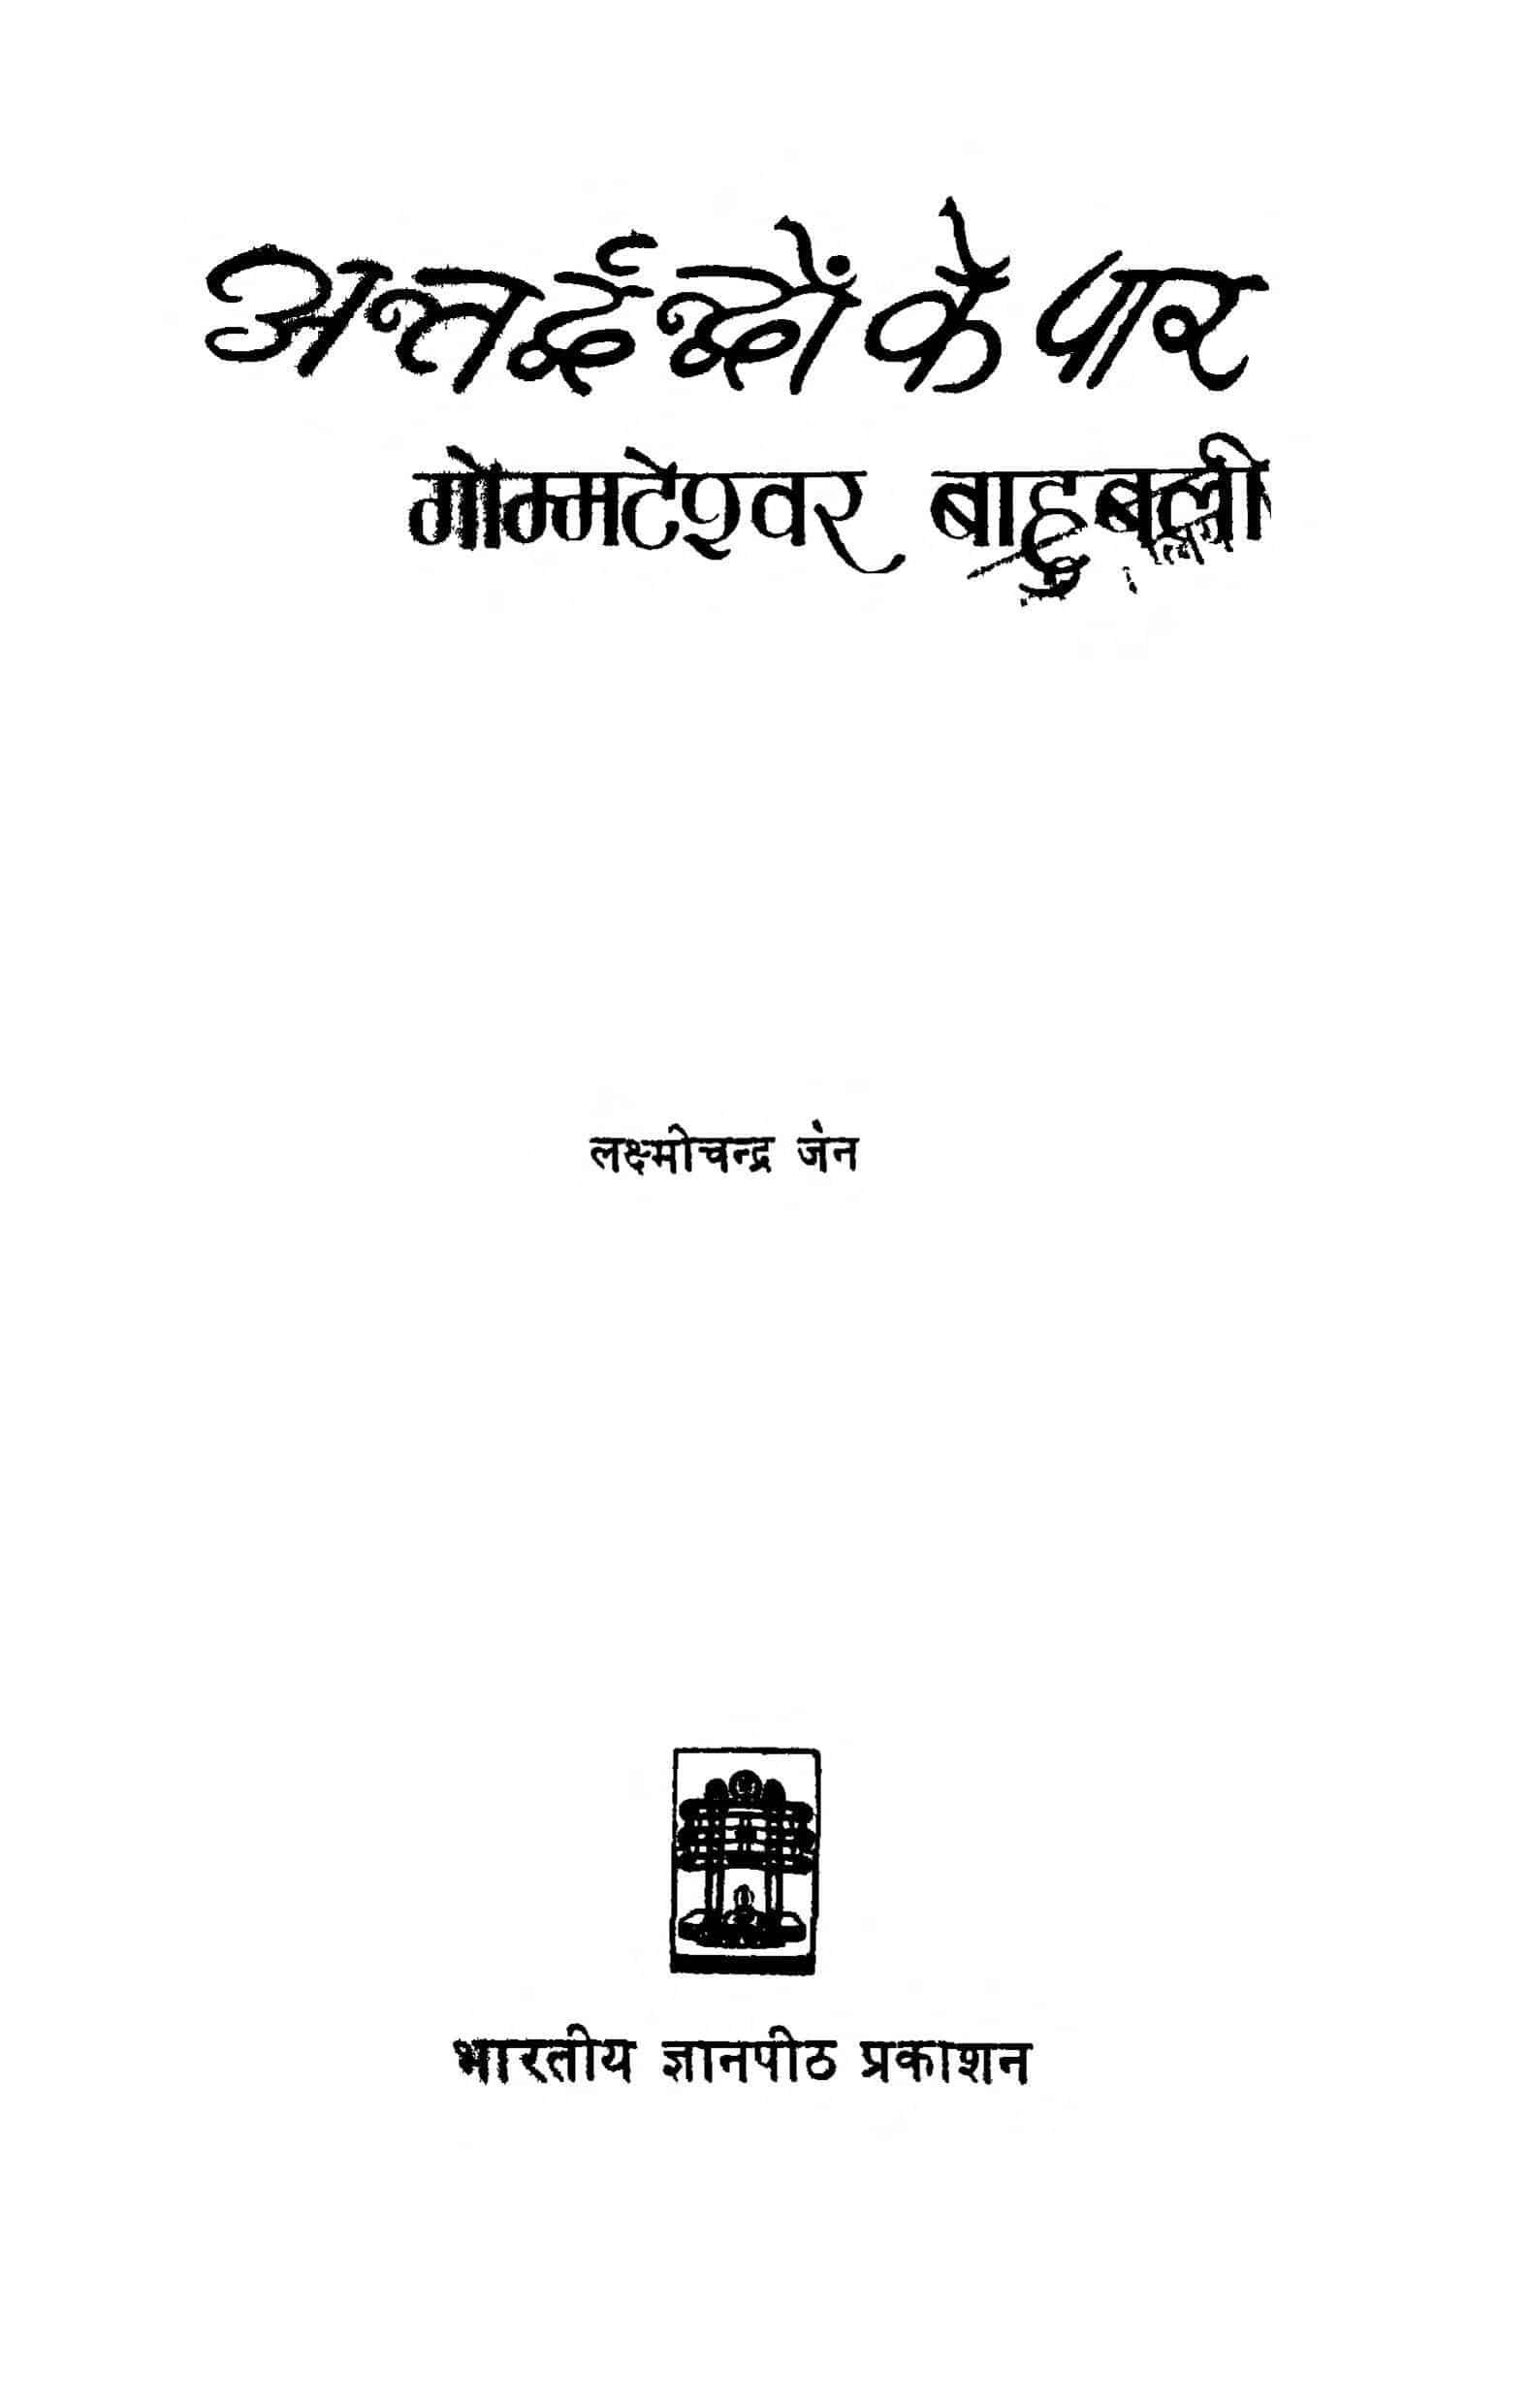 Book Image : अन्तर्द्वन्द्वों के पार गोम्मटेश्वर बाहुबली - Antardvandvon Ke Paar Gommateshvar Bahubali